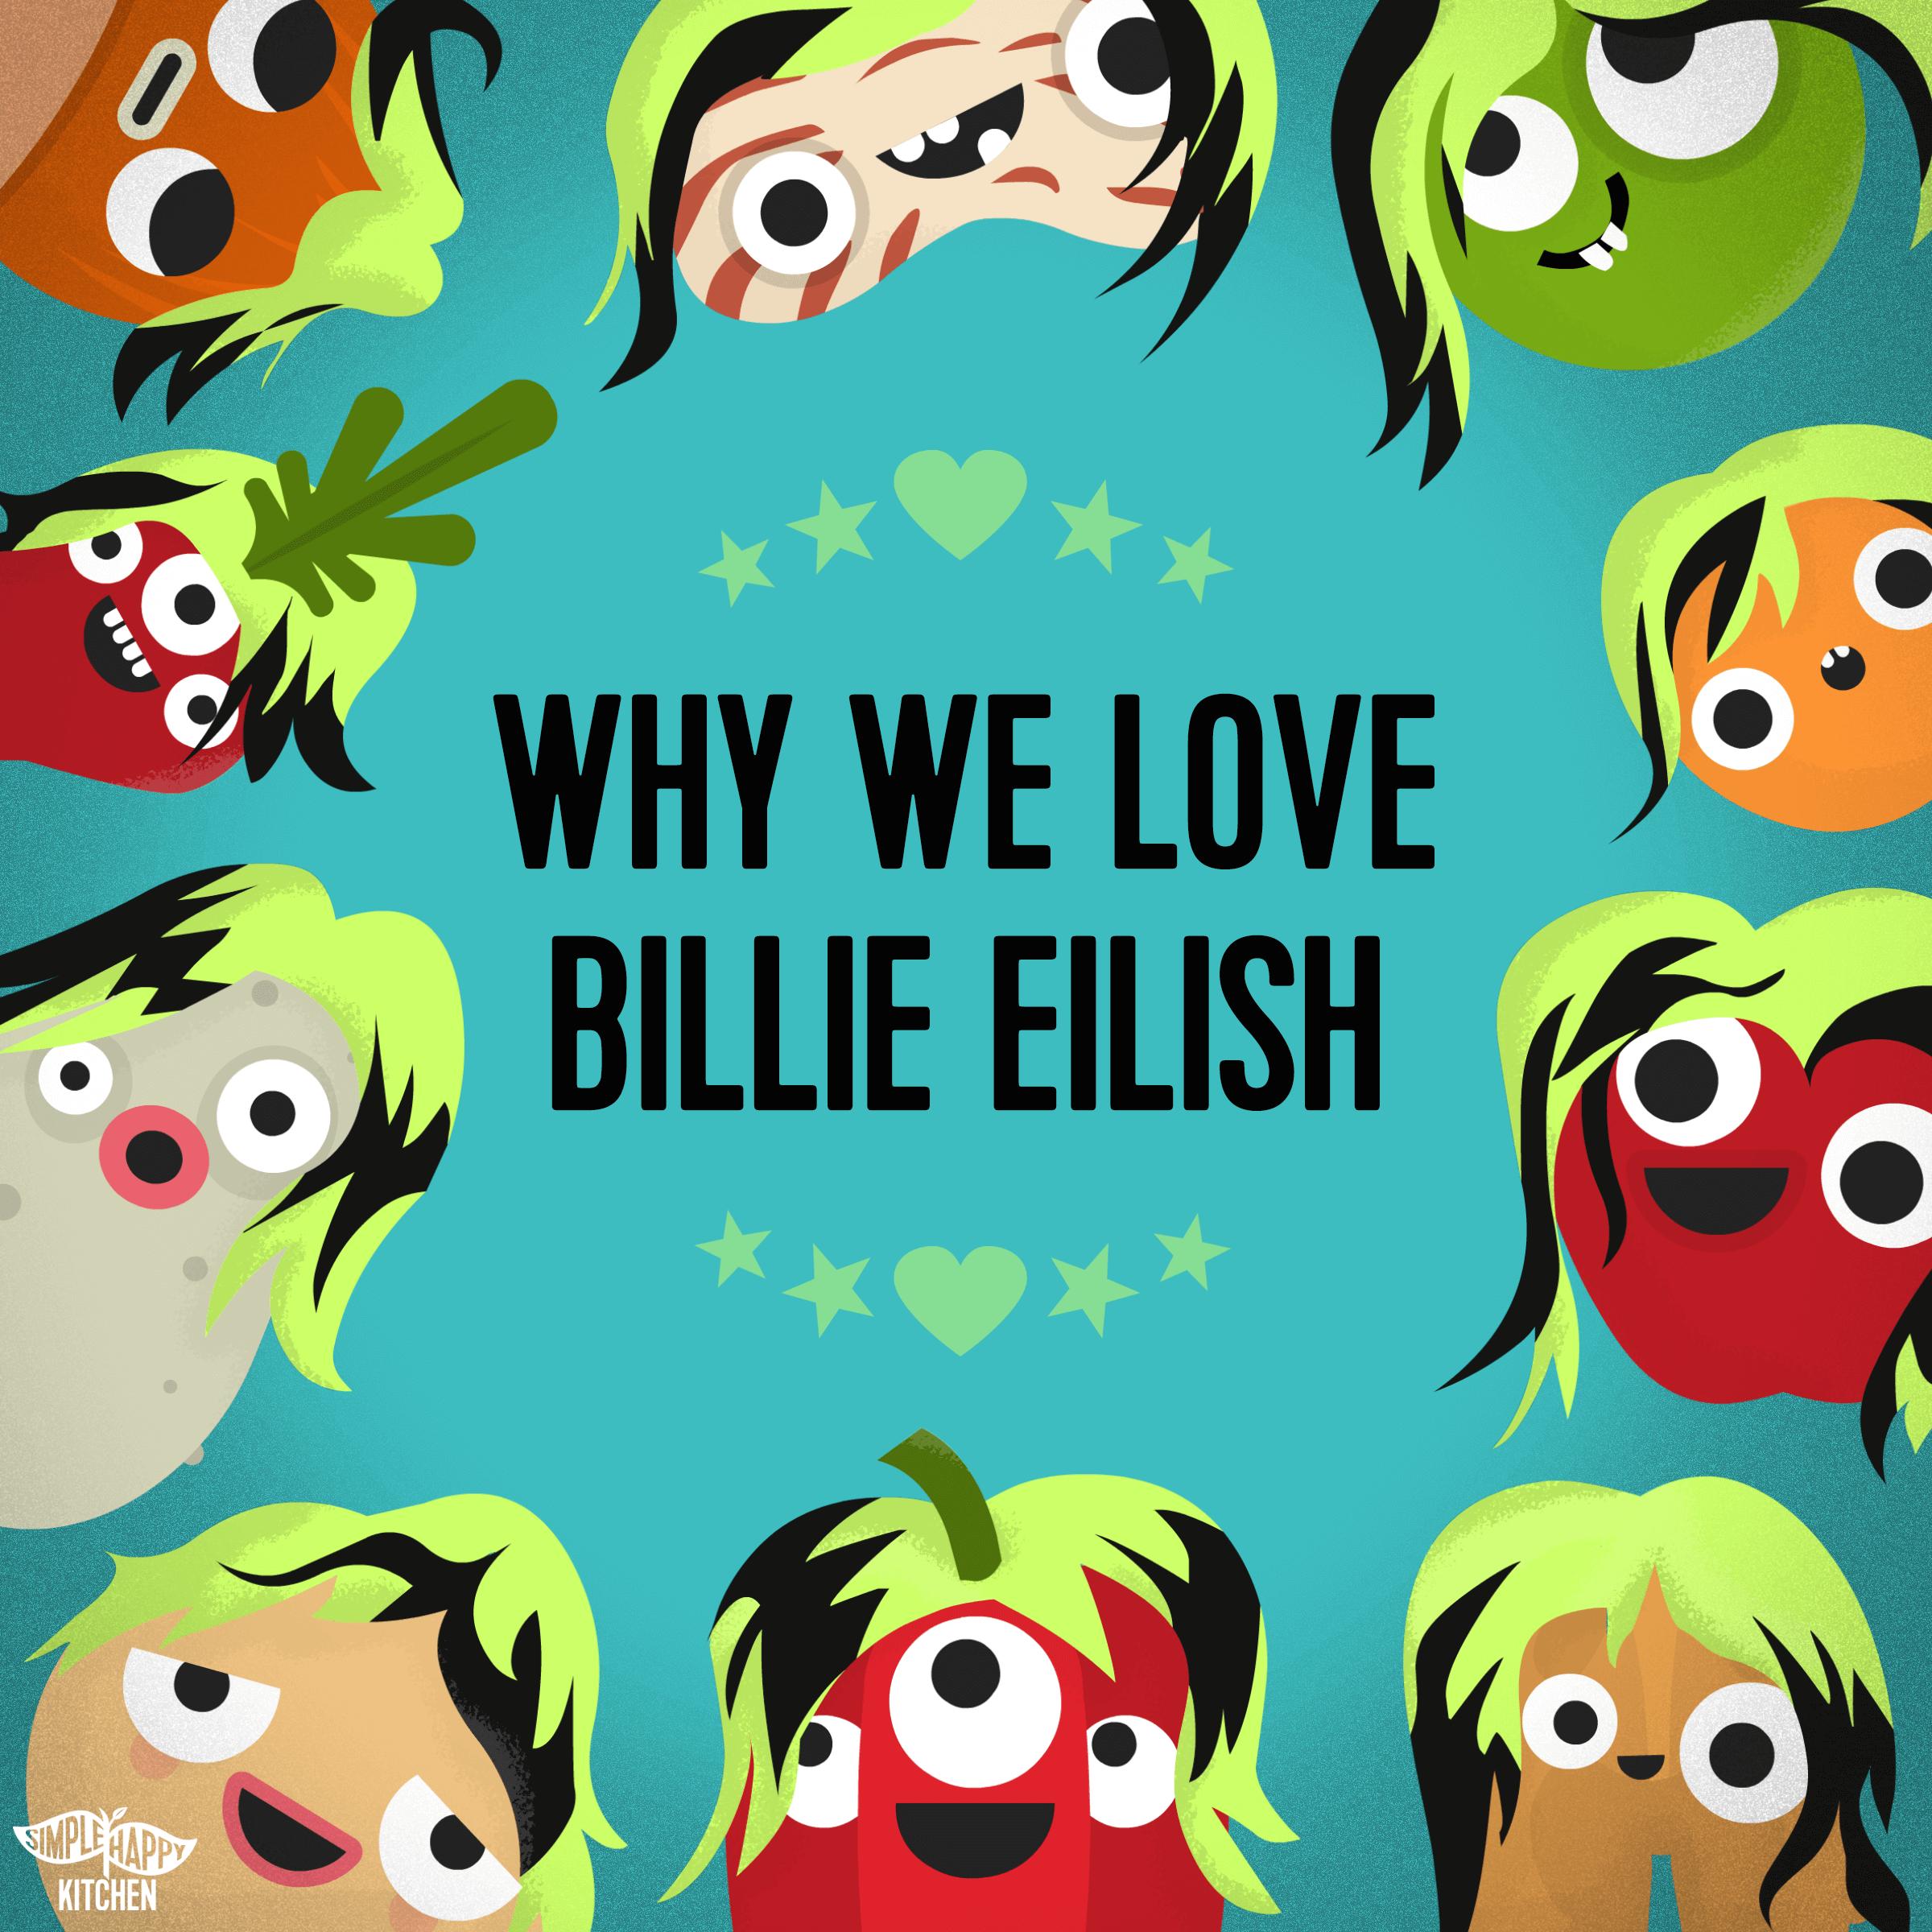 Why we love Billie Eilish